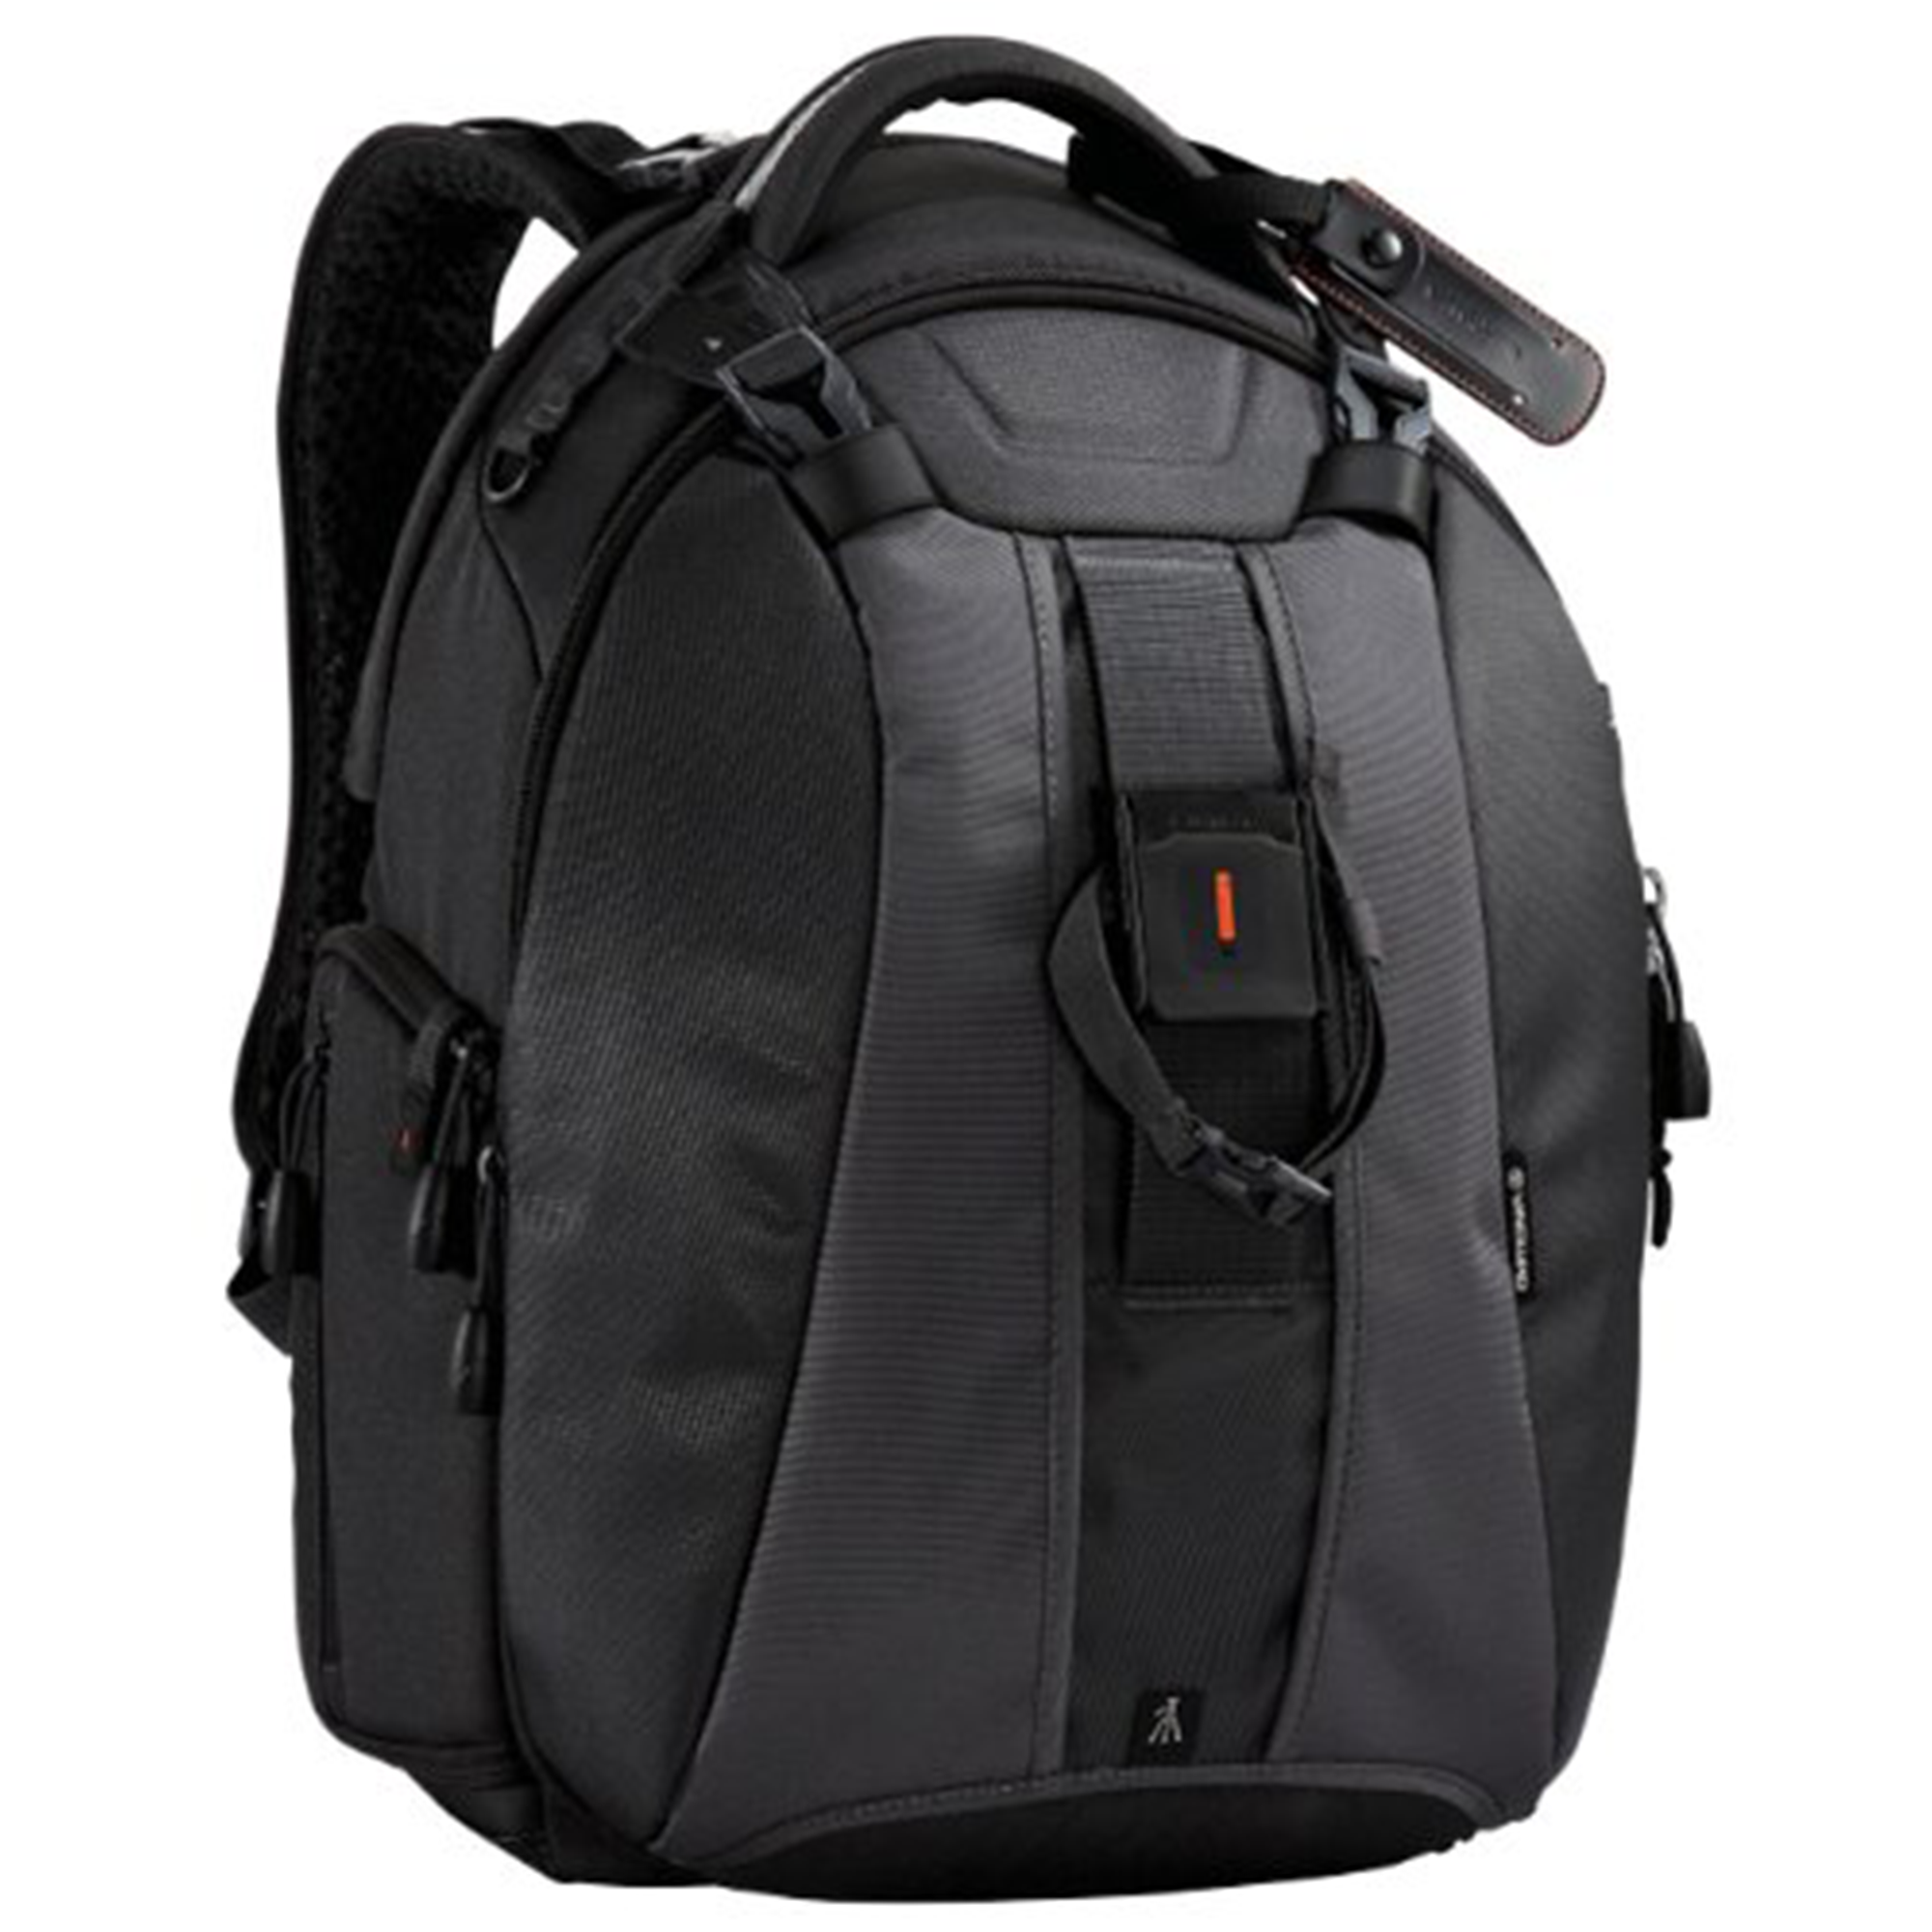 Vanguard Skyborne 51 Bag